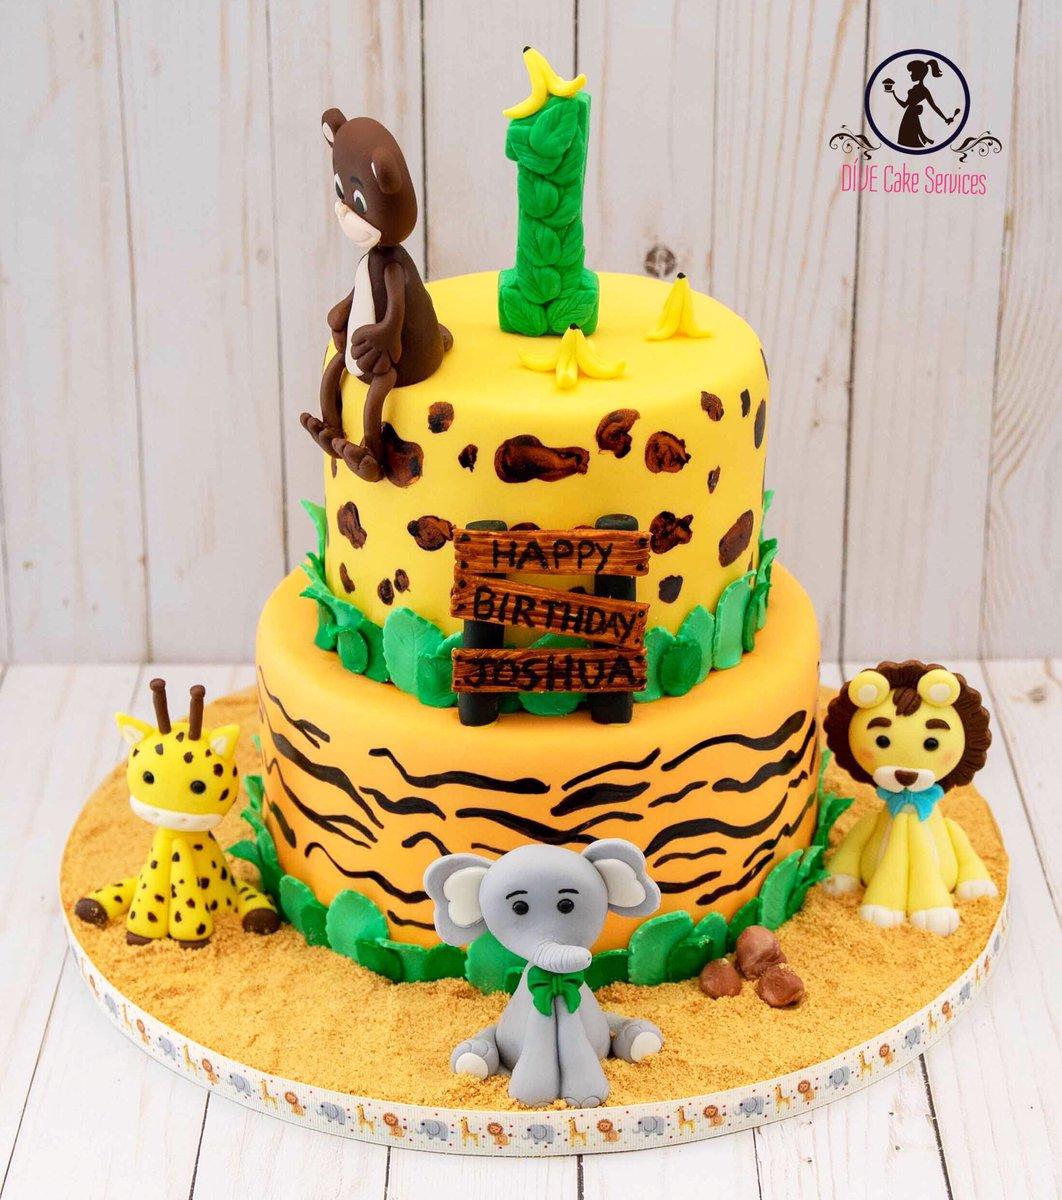 Pleasant Dive Cake Services Divecake Twitter Funny Birthday Cards Online Hendilapandamsfinfo